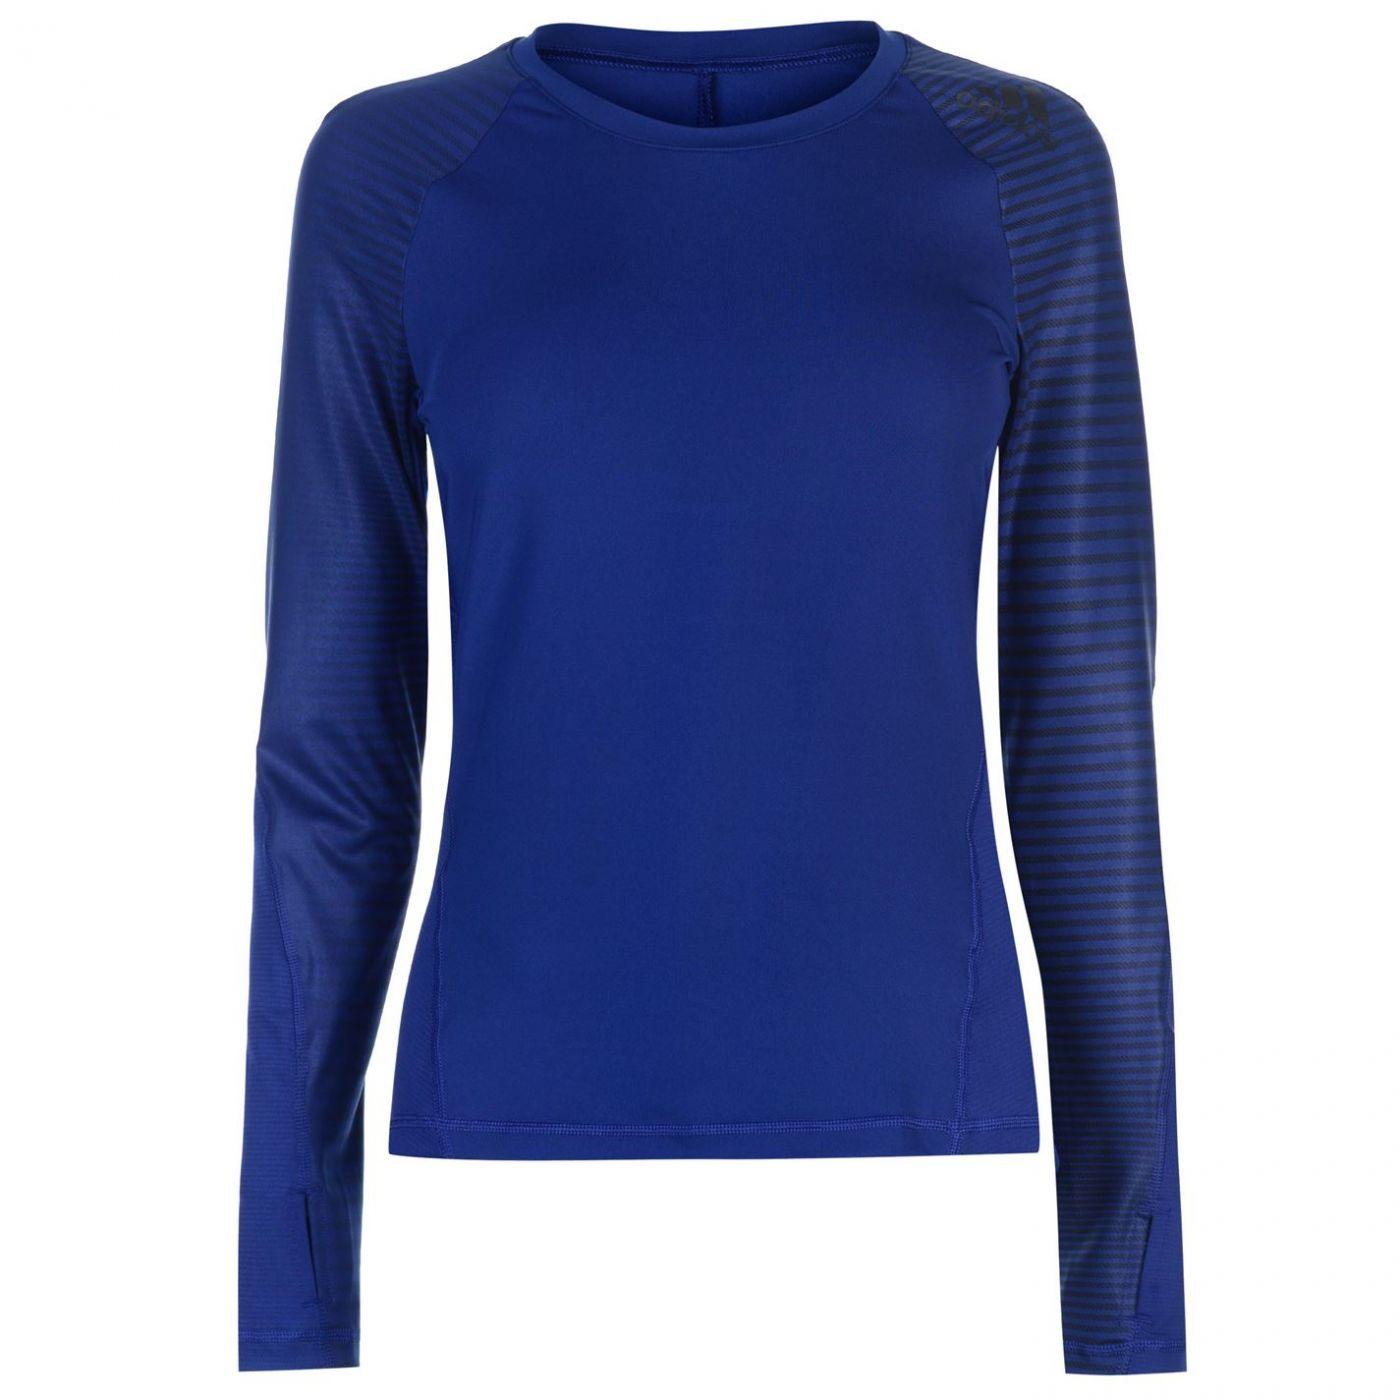 Adidas Alphaskin Long Sleeve T Shirt Ladies